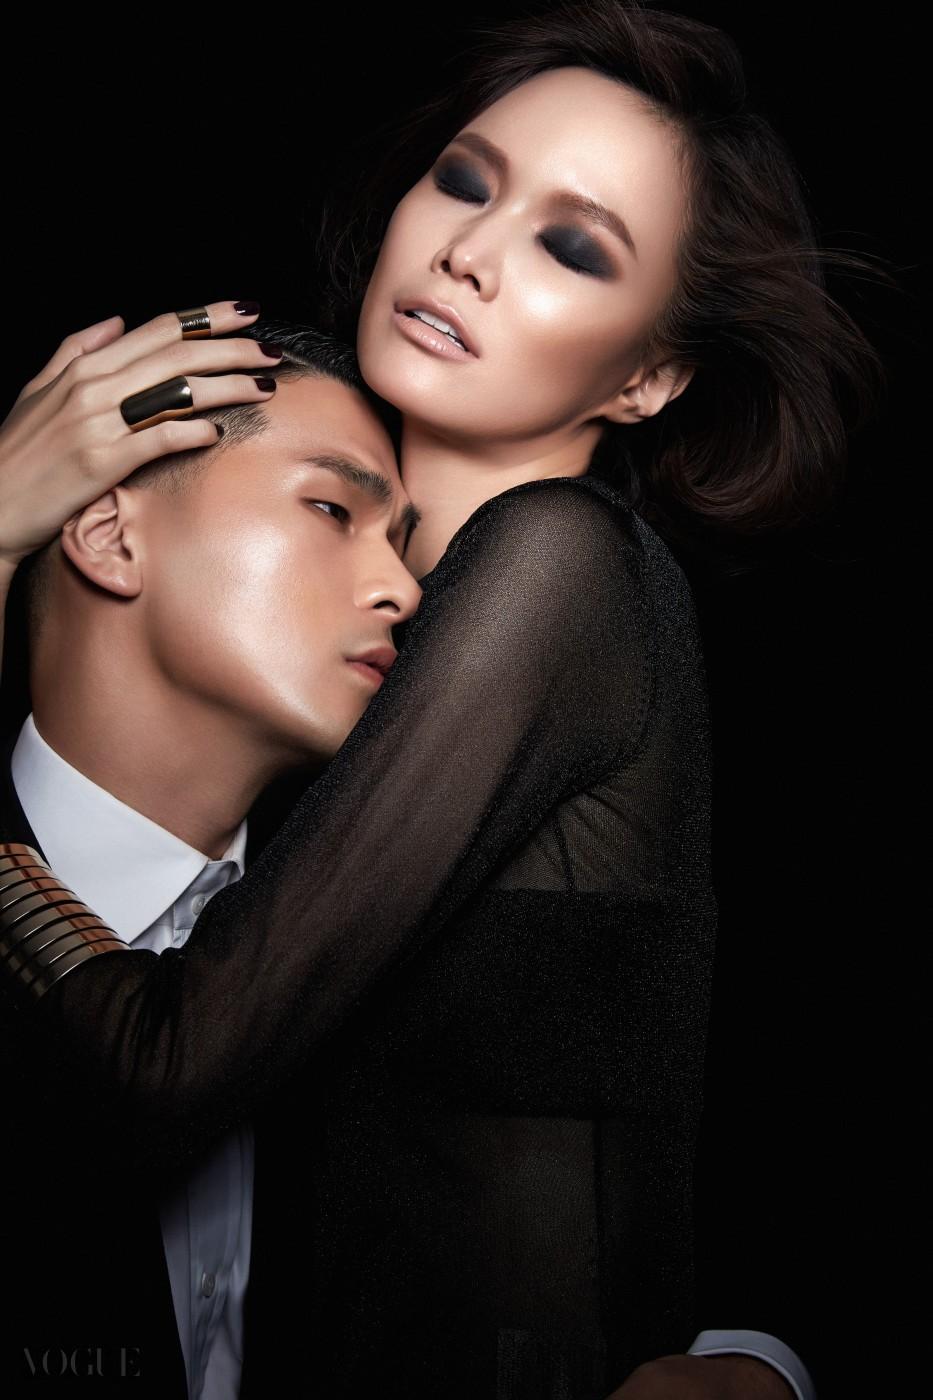 WOMAN IN PINK 때론 강렬하고 관능적으로 때론 우아하고 부드럽게, 자신만의 룩을 과감하게 표현하는 것.    자신에게 어울리는 컬러를 주저없이 선택할 줄 아는 자신감이야말로 톰 포드 뷰티가 향하는 궁극의 아름다움이다.  WOMAN 일루미네이팅 프라이머로 고급스러운 윤기를 얼굴 전체에 흐르도록 한 후, 트레이슬레스 파운데이션 SPF 15로 빛나는 윤기를 한층 더 강조해 준다. 일루미네이팅 하이라이트 펜으로 눈 아래와 T존 등을 가볍게 쓸어, 화사하면서도 입체감있는 피부 표현을 마무리한다. 치크 컬러 '플란틱 핑크'로 가볍게 쓸어 여성스러움을 더한 후, 아이 쿼드 '세덕티브 로즈'의 핑크 컬러로 은은하게 터치한 후 퍼플 컬러를 눈두덩에 넓게 펴 발라, 깊이감있고 여성적인 눈매를 연출한다. 핫한 핑크 컬러의 립 컬러 '플라밍고'를 발라 여성스러운 느낌을 완성한다. 사용 제품은 모두 톰 포드 뷰티.  MAN 브론징 젤을 광대와 턱선에 펴 발라 뚜렷한 윤곽을 강조하면서도 태닝된 듯 섹시한 남성미를 극대화한다. 그 위에 톰 포드 일루미네이팅 프라이머로 매끈하면서도 고급스러운 윤기를 더한다. 사용 제품은 모두 톰 포드 뷰티.  의상은 톰 포드.